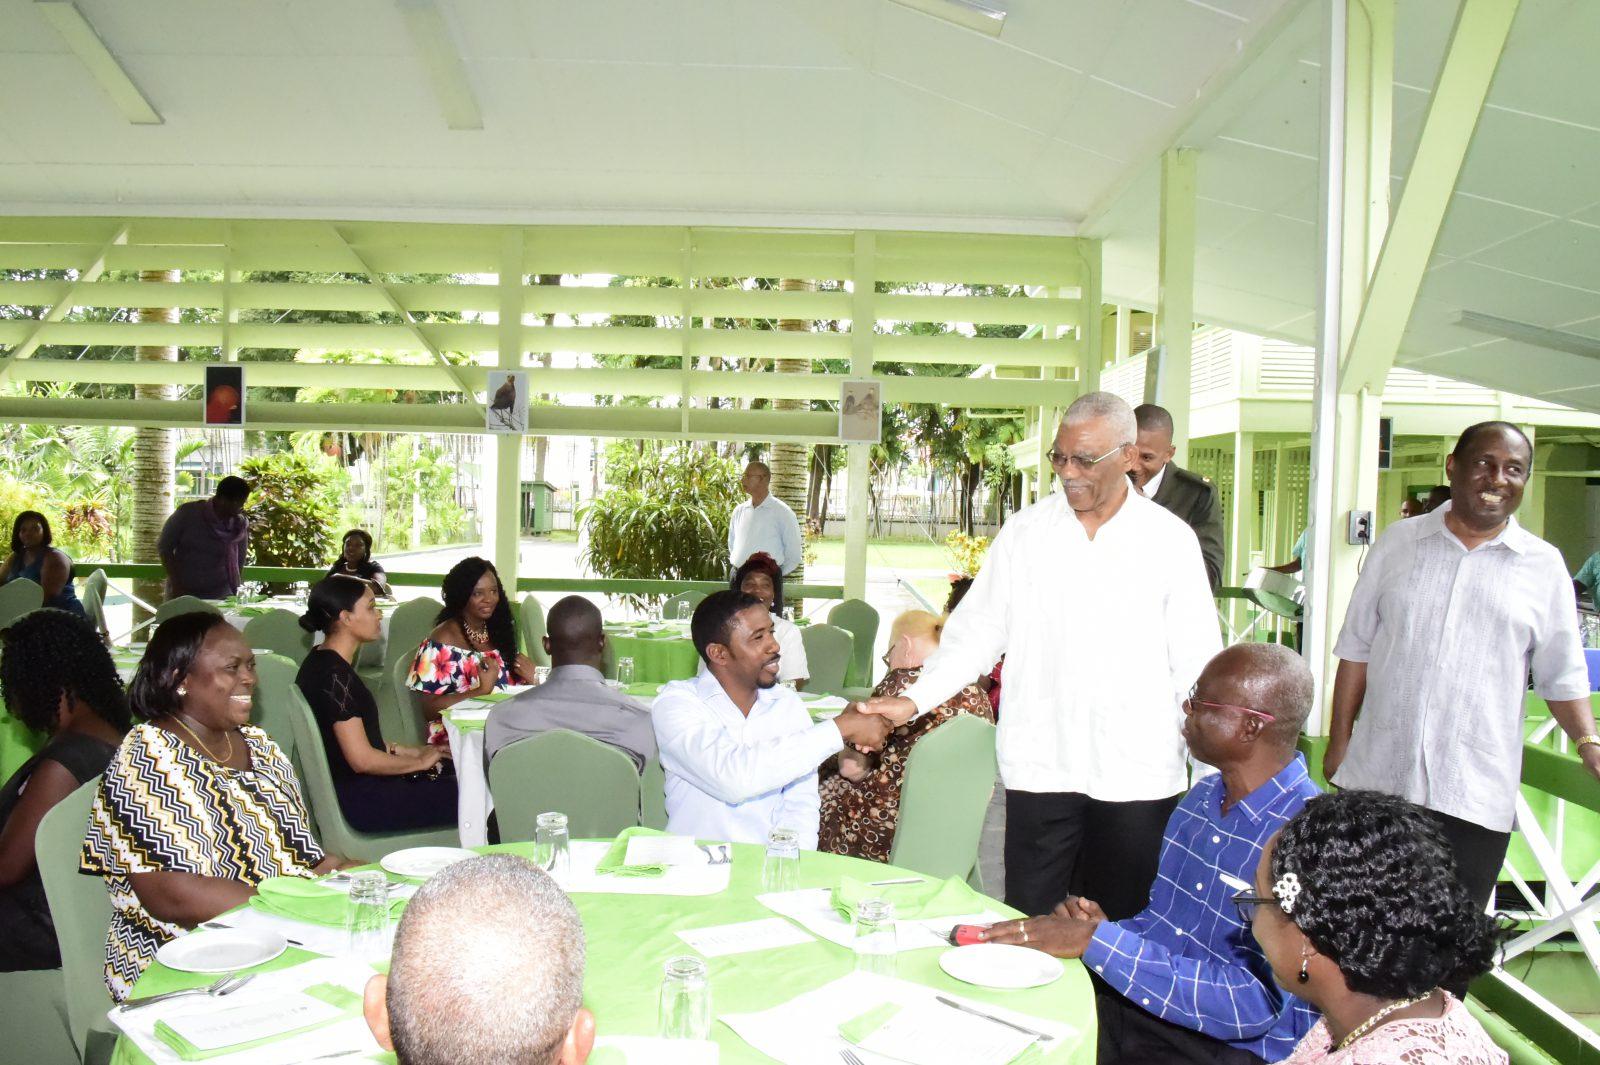 President David Granger attended the Guyana Public Service Union's 95th Anniversary Church Service